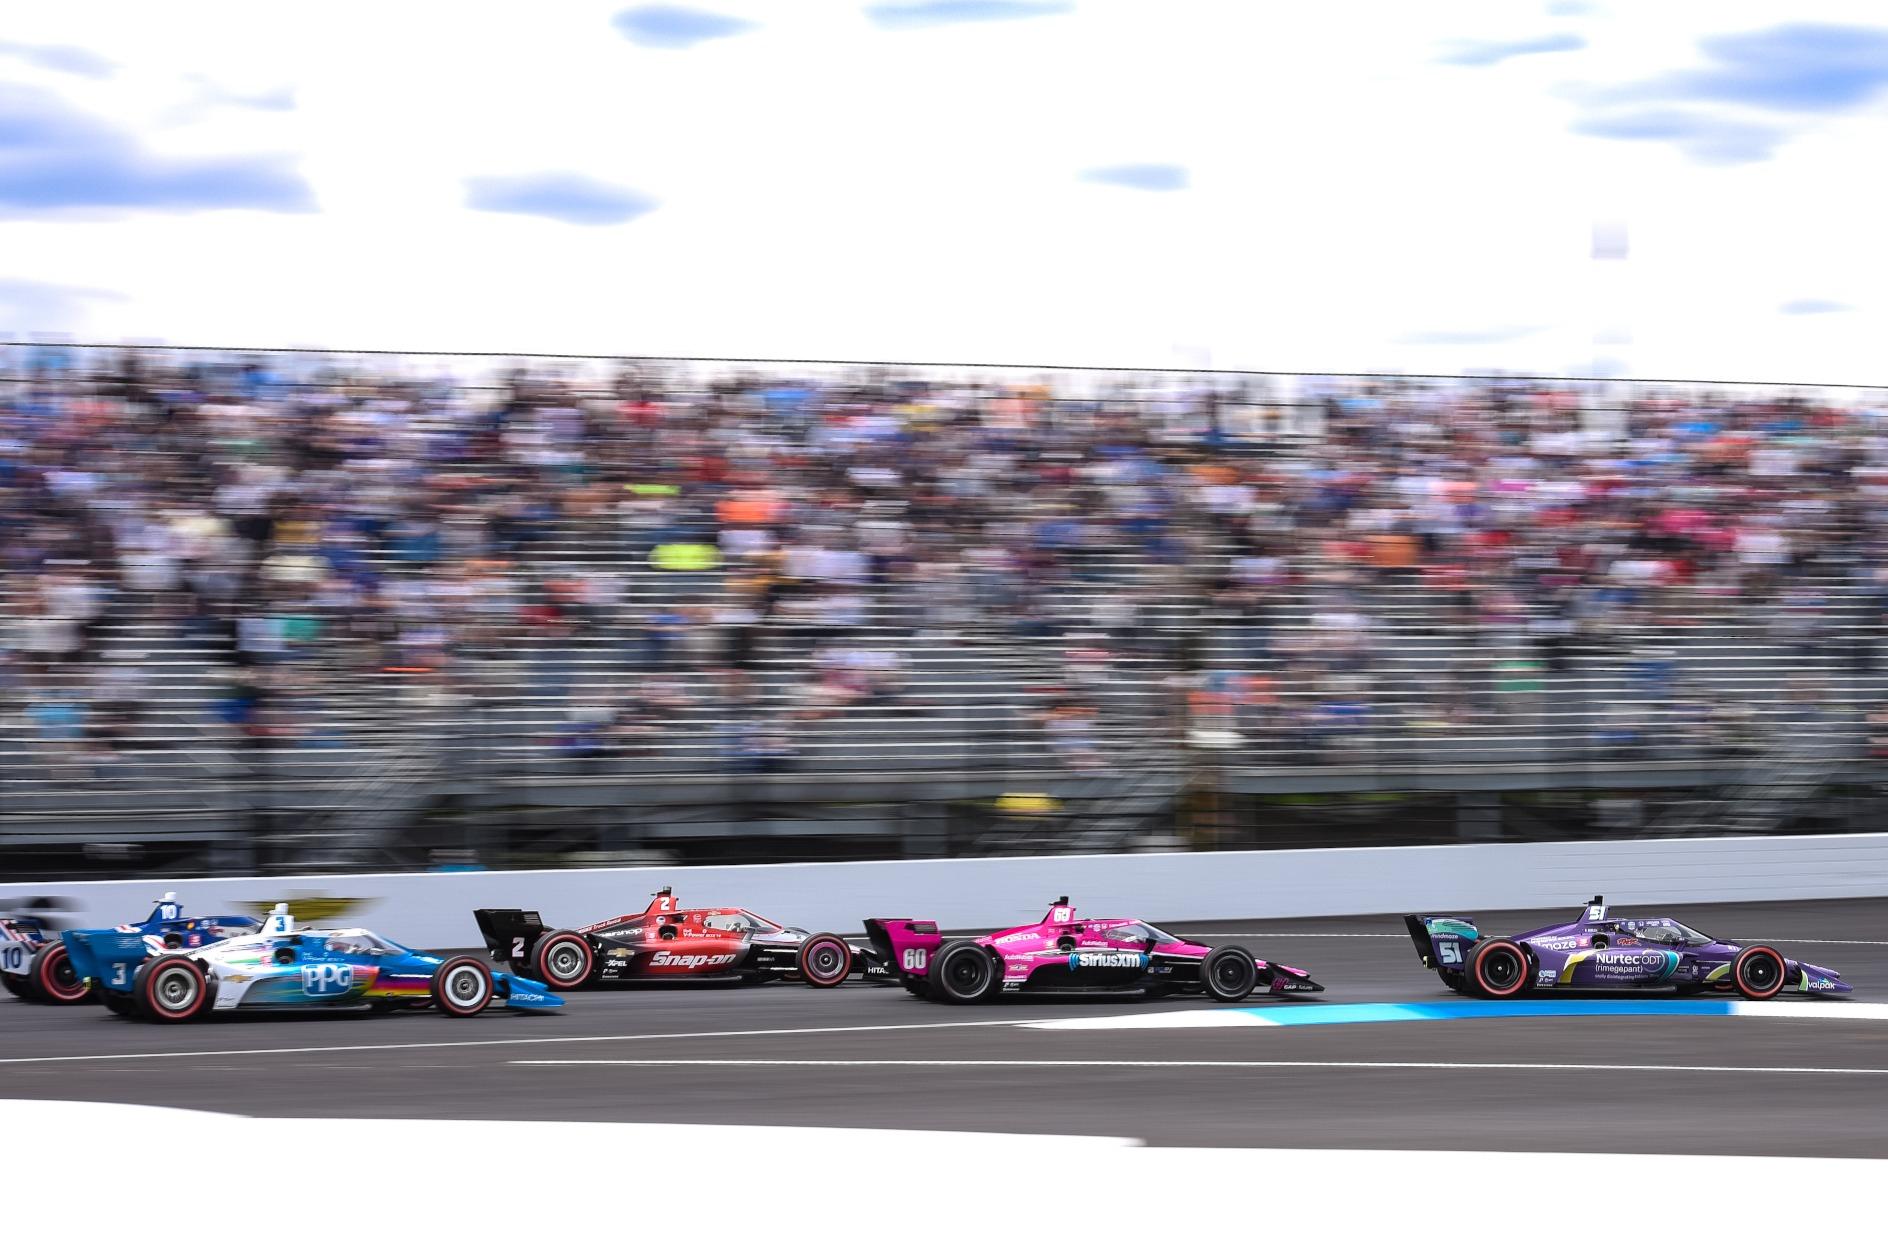 Grosjean leads into Turn 1 at the start